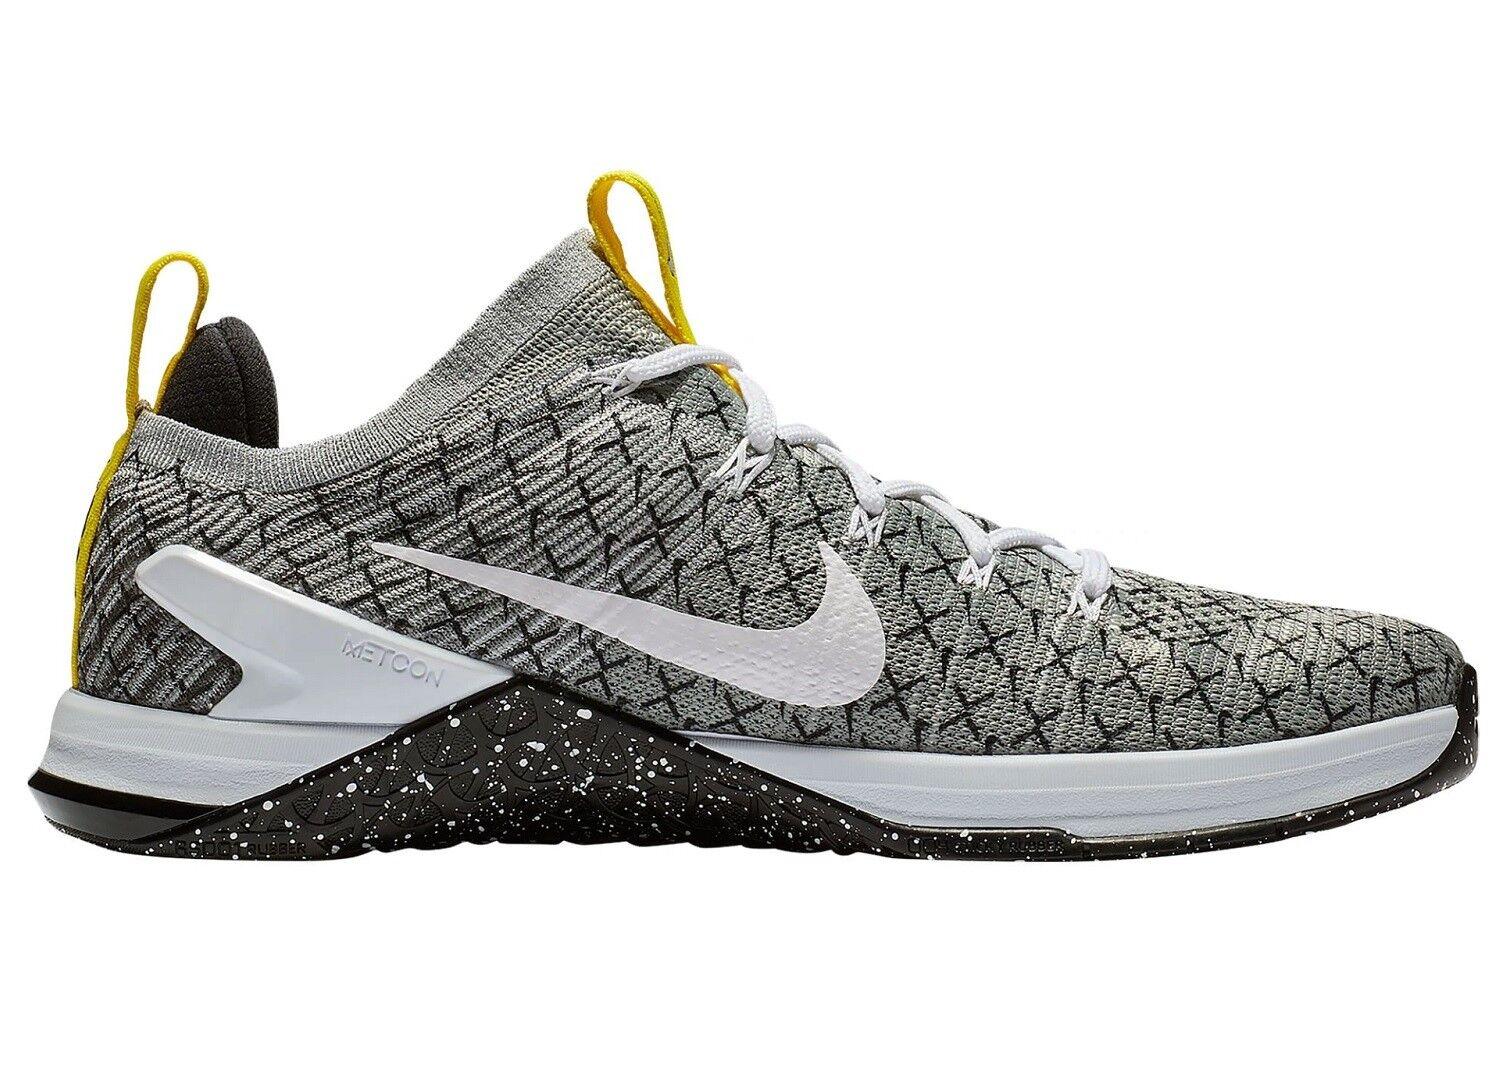 Nike Metcon DSX Flyknit 2 X Mens AO2807-017 Black Cross Training Shoes Comfortable Seasonal price cuts, discount benefits